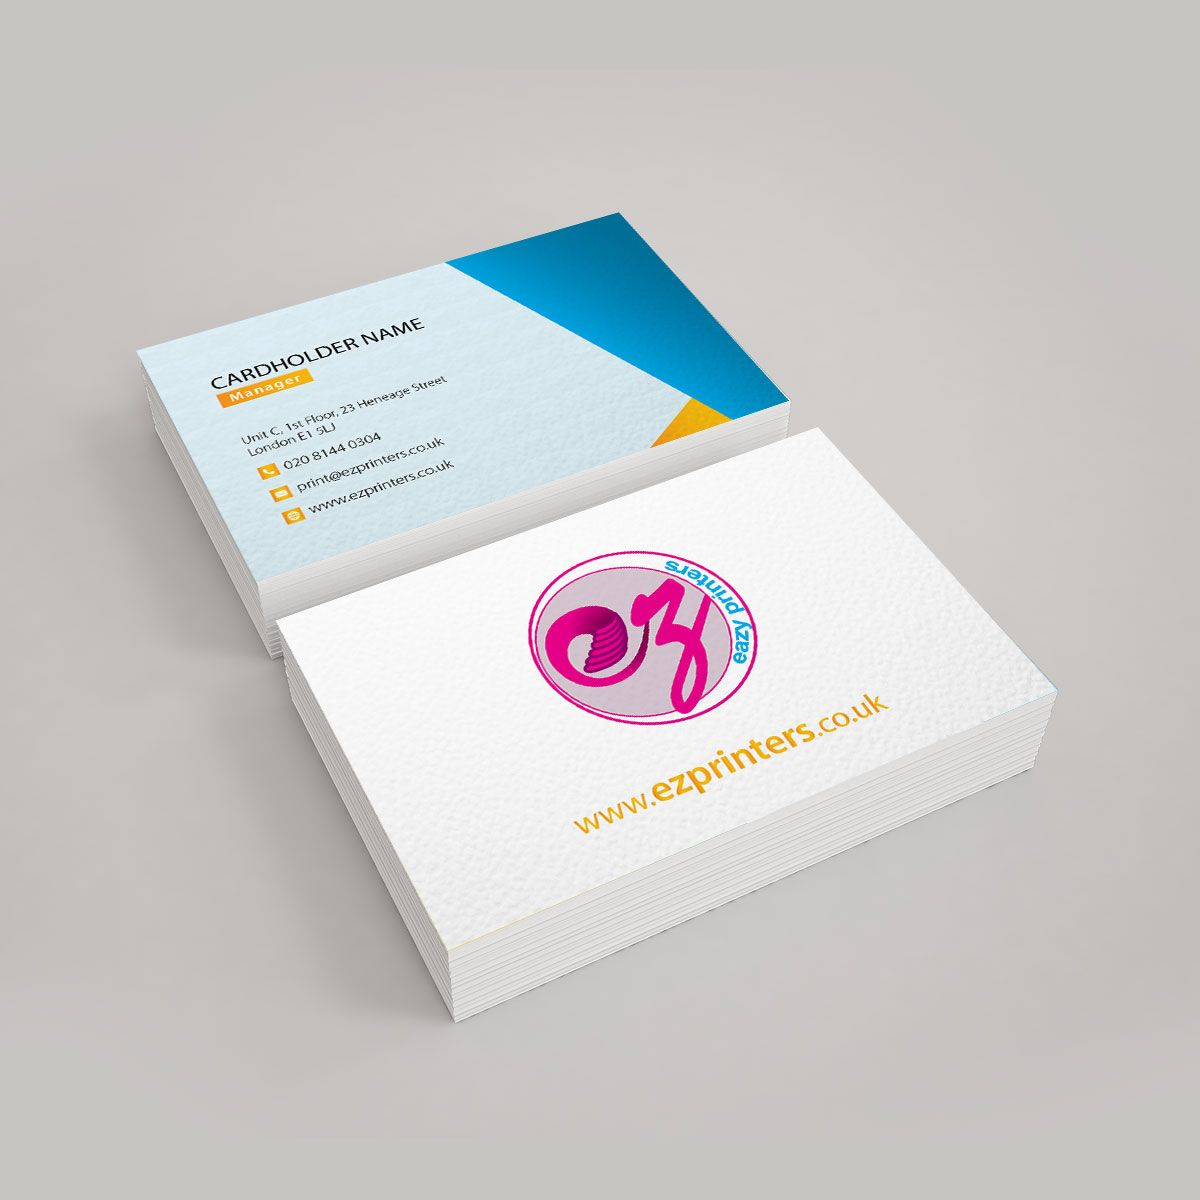 Standard Business Cards Printing London Ez Printers Printing Business Cards High Quality Business Cards Stylish Business Cards